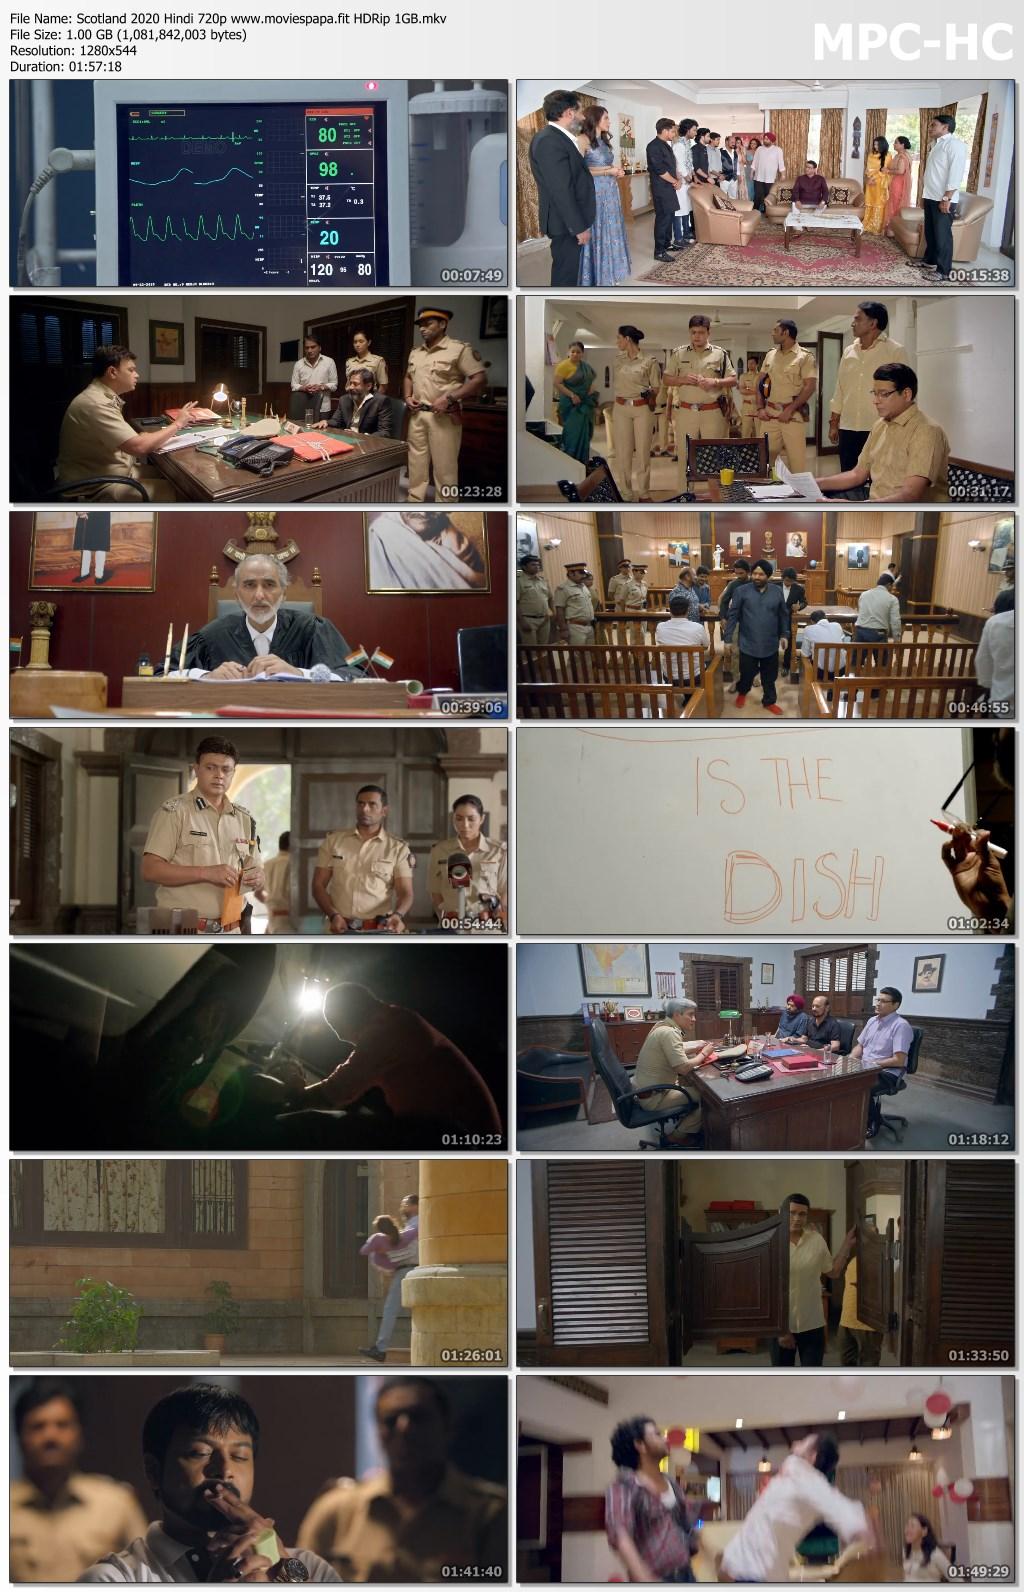 Scotland 2020 Hindi Movie 720p HDRip 1GB Download